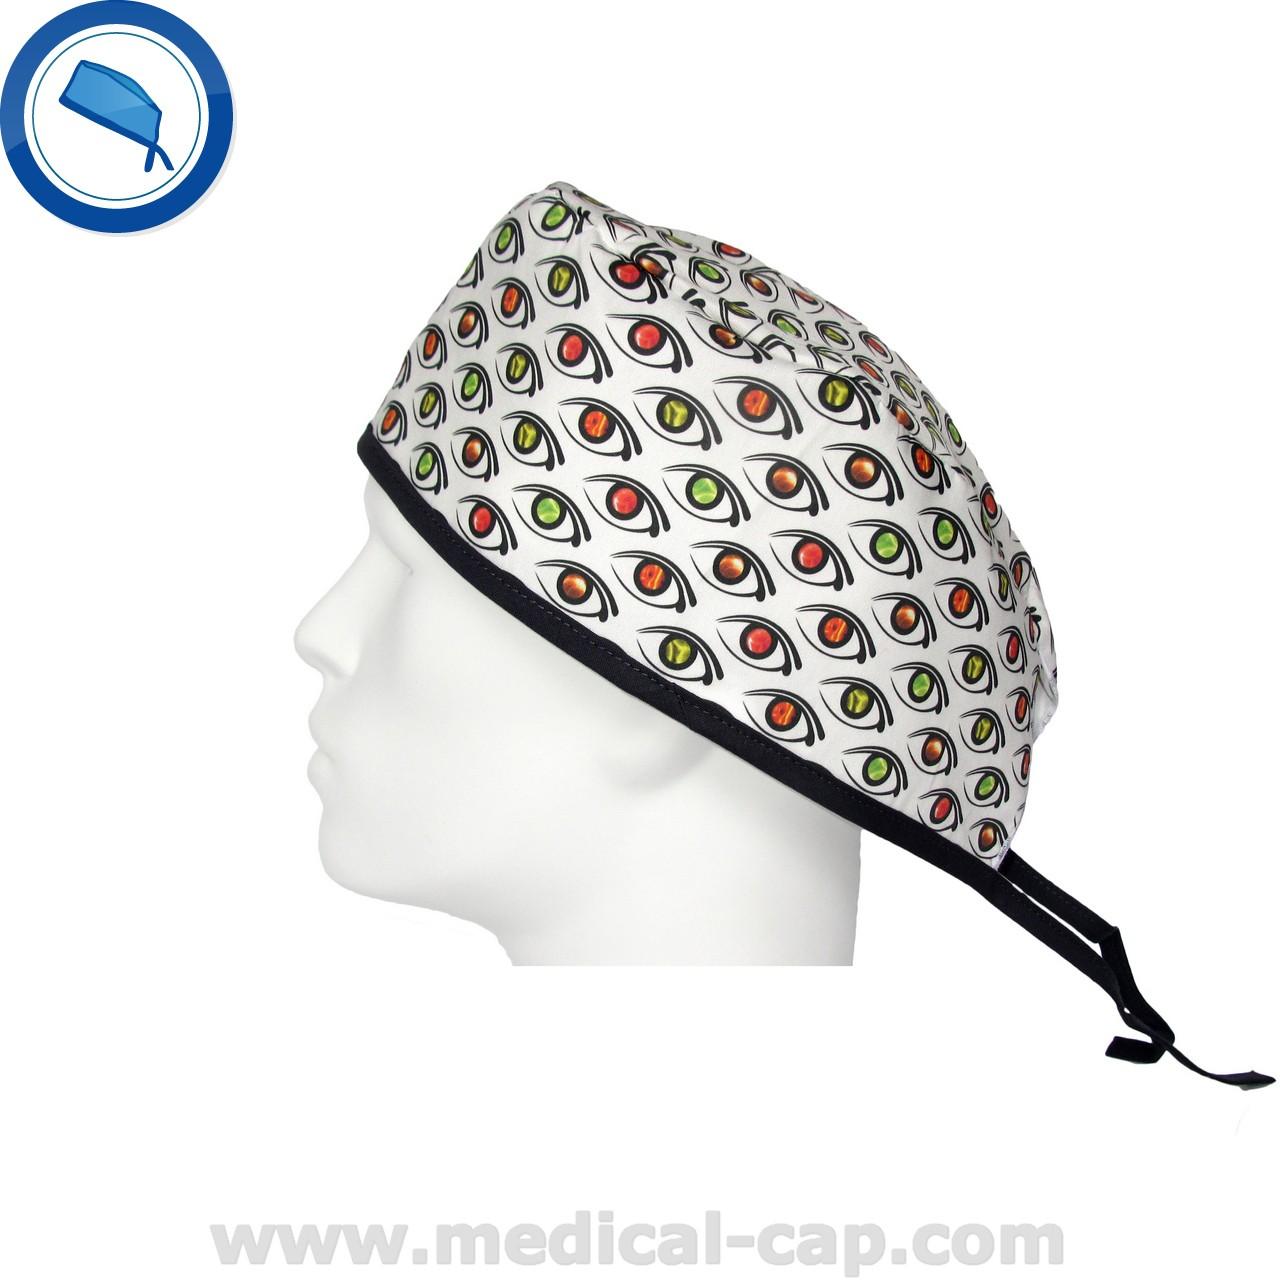 fef030f680f Opticians ophthalmologists Cap. Laser eye surgery – Man